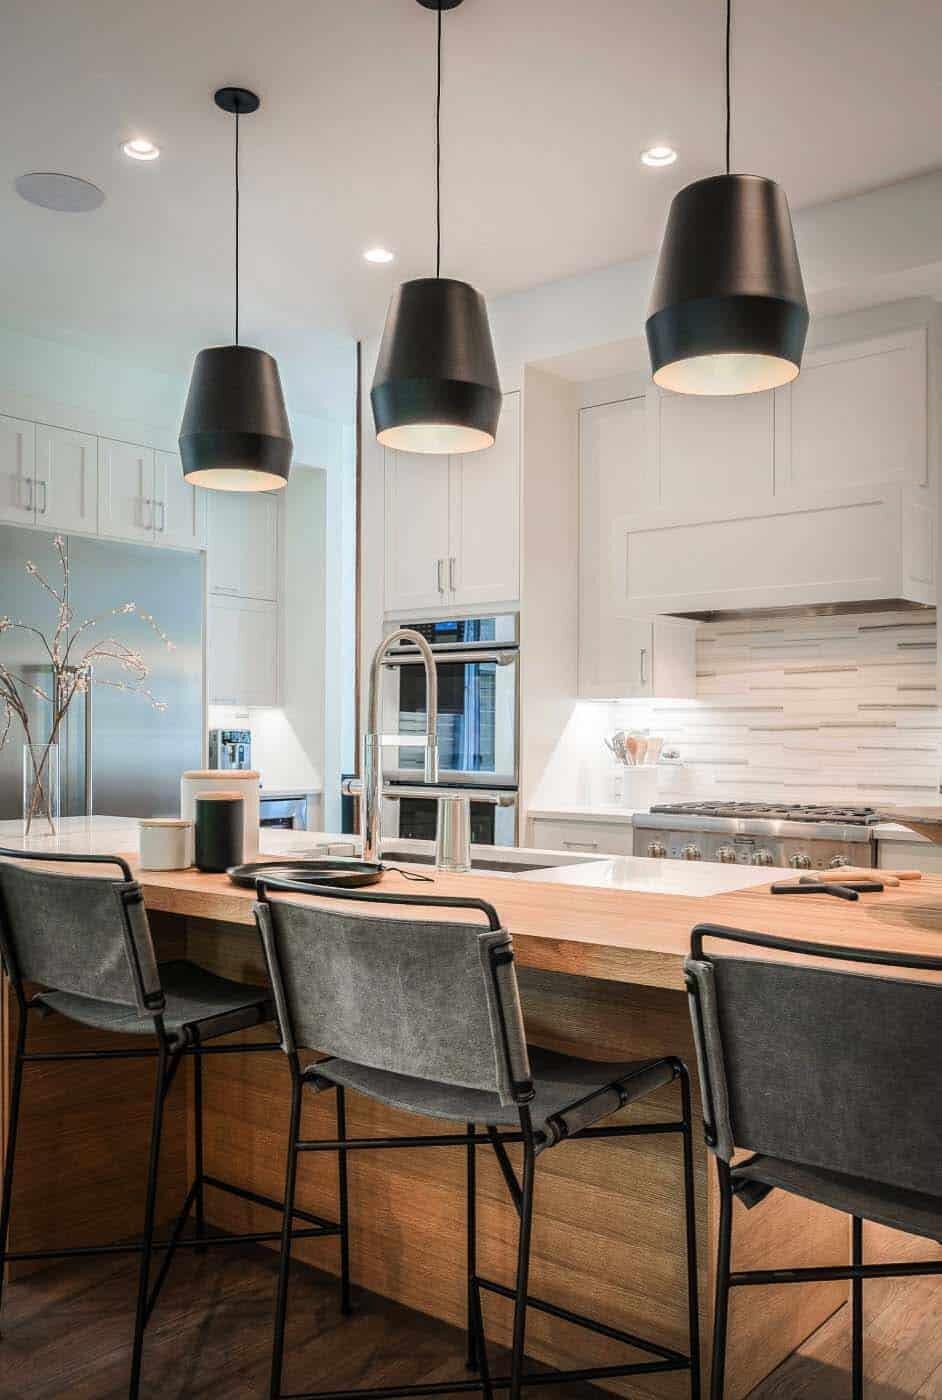 Organic-Modern-Style-Home-Urbanology-Designs-09-1-Kindesign.jpg